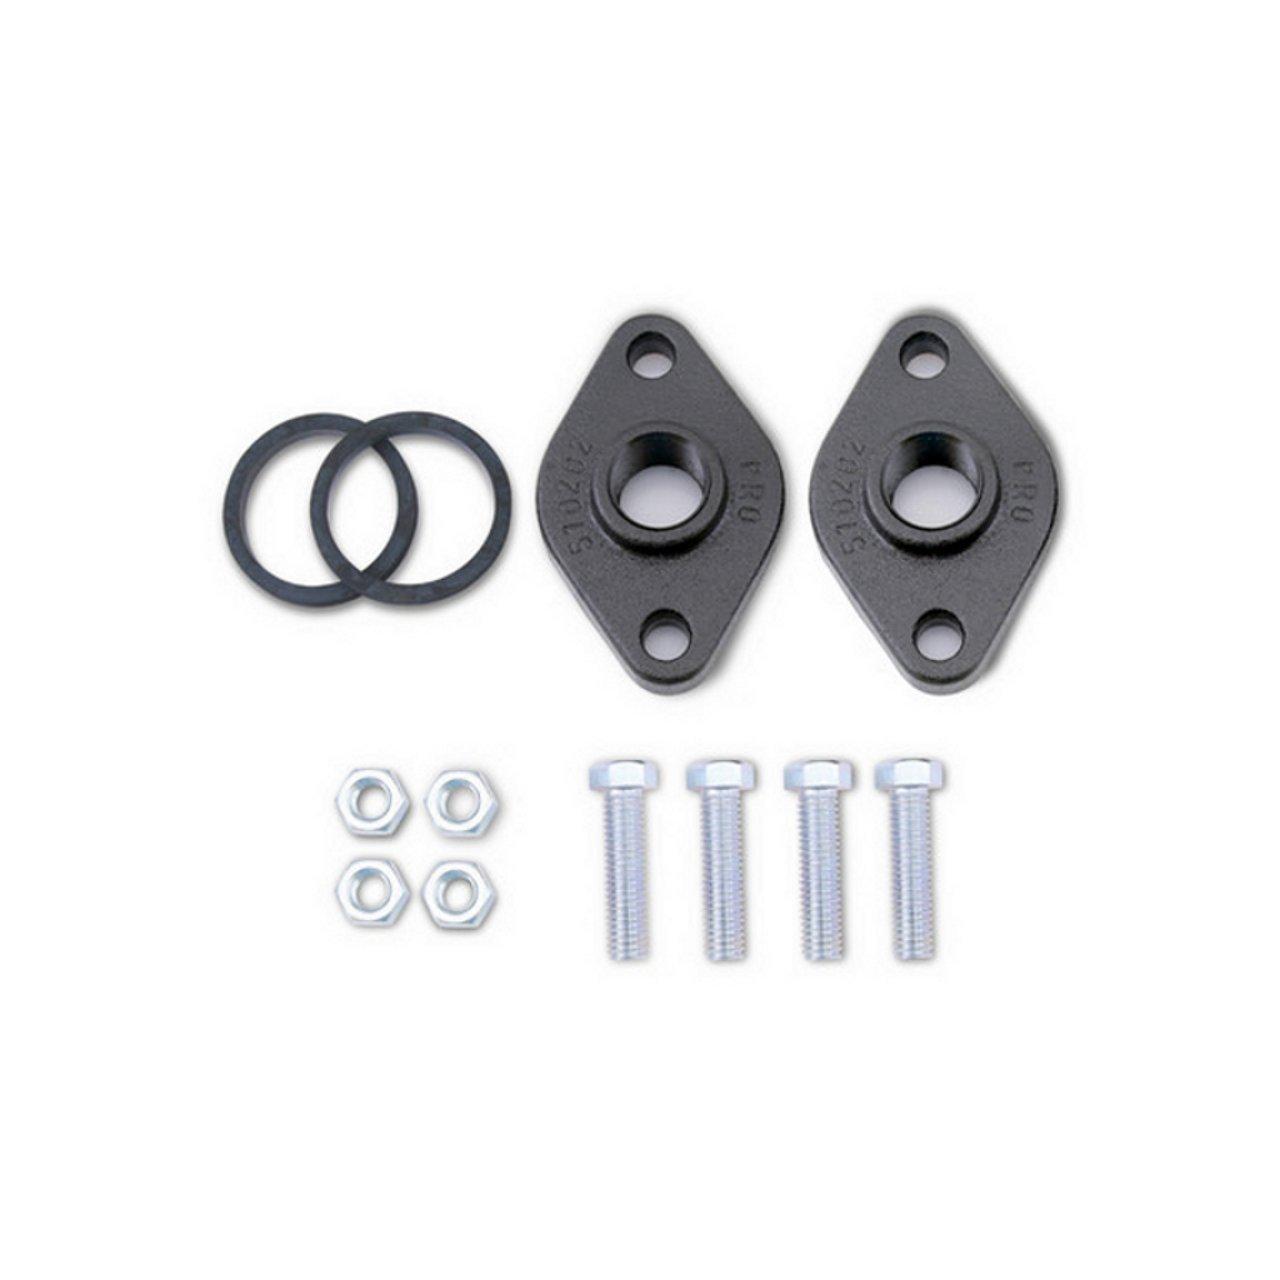 "Grundfos 519601 3/4"" Npt Cast Iron Circulator Pump Packaged Flange Set"